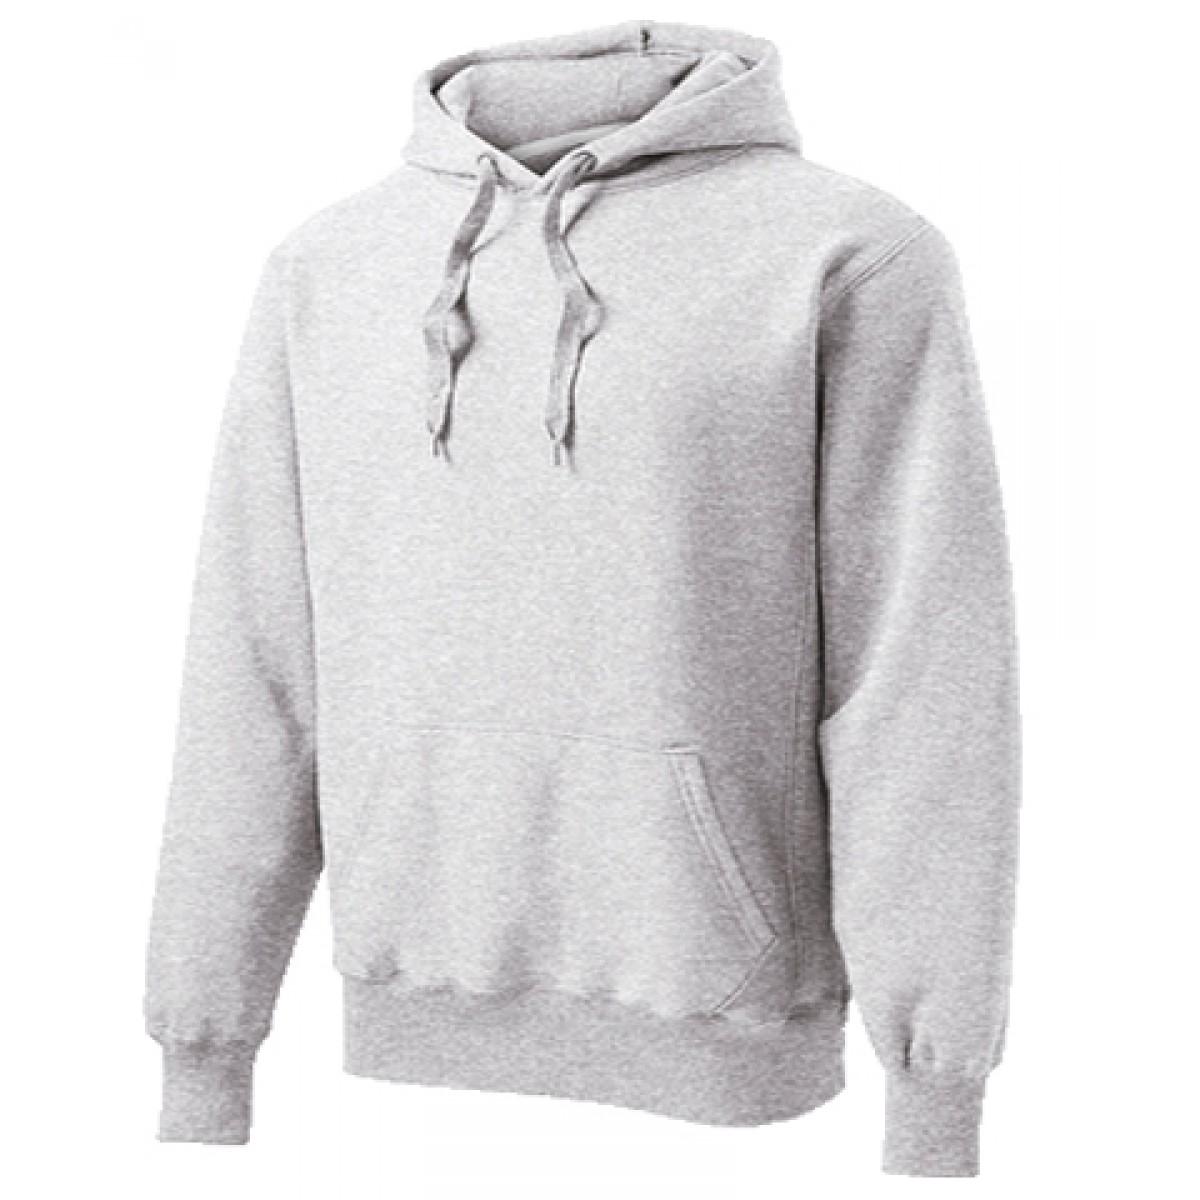 Hooded Sweatshirt 50/50 Heavy Blend Gray-Gray -YL